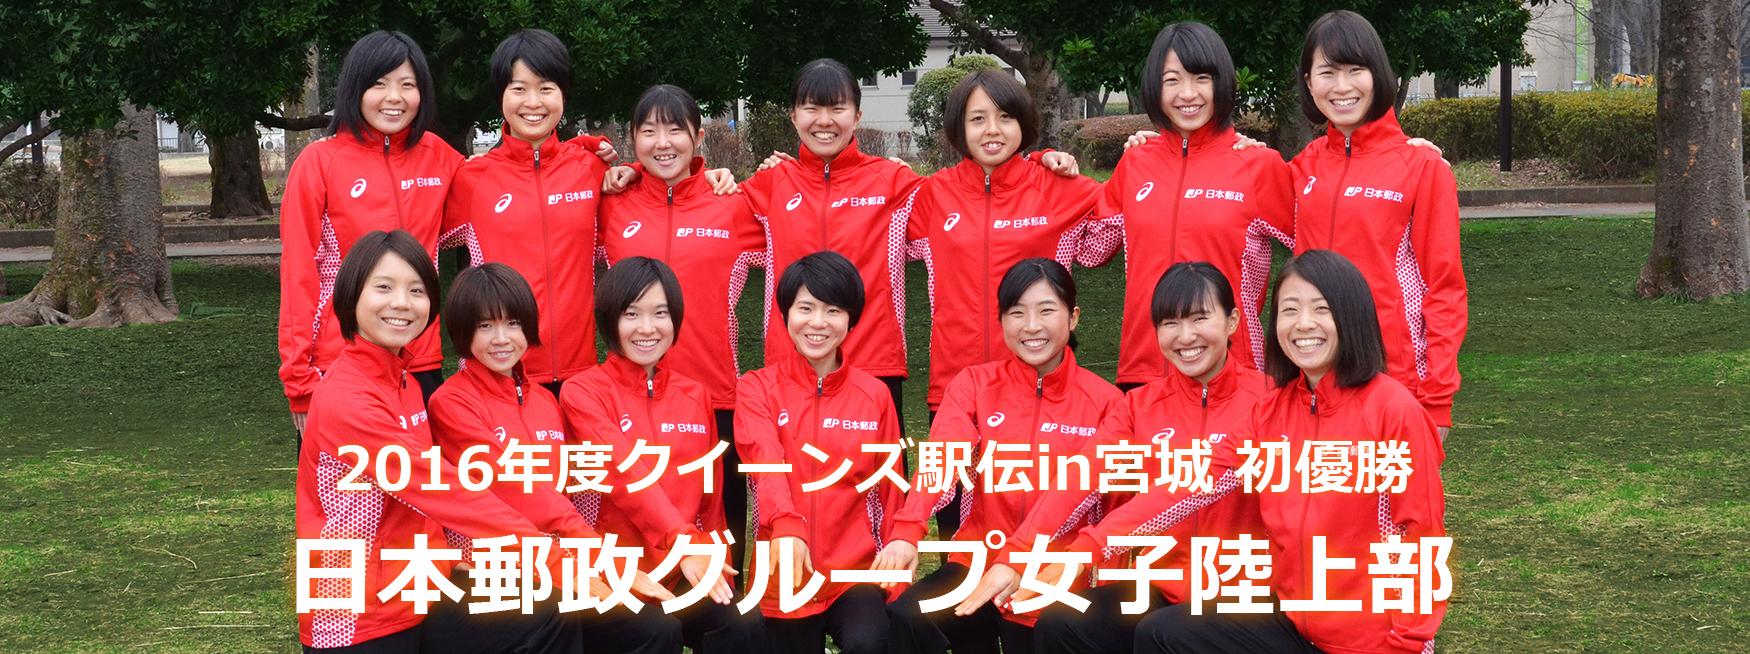 日本郵政グループ女子陸上部 201704